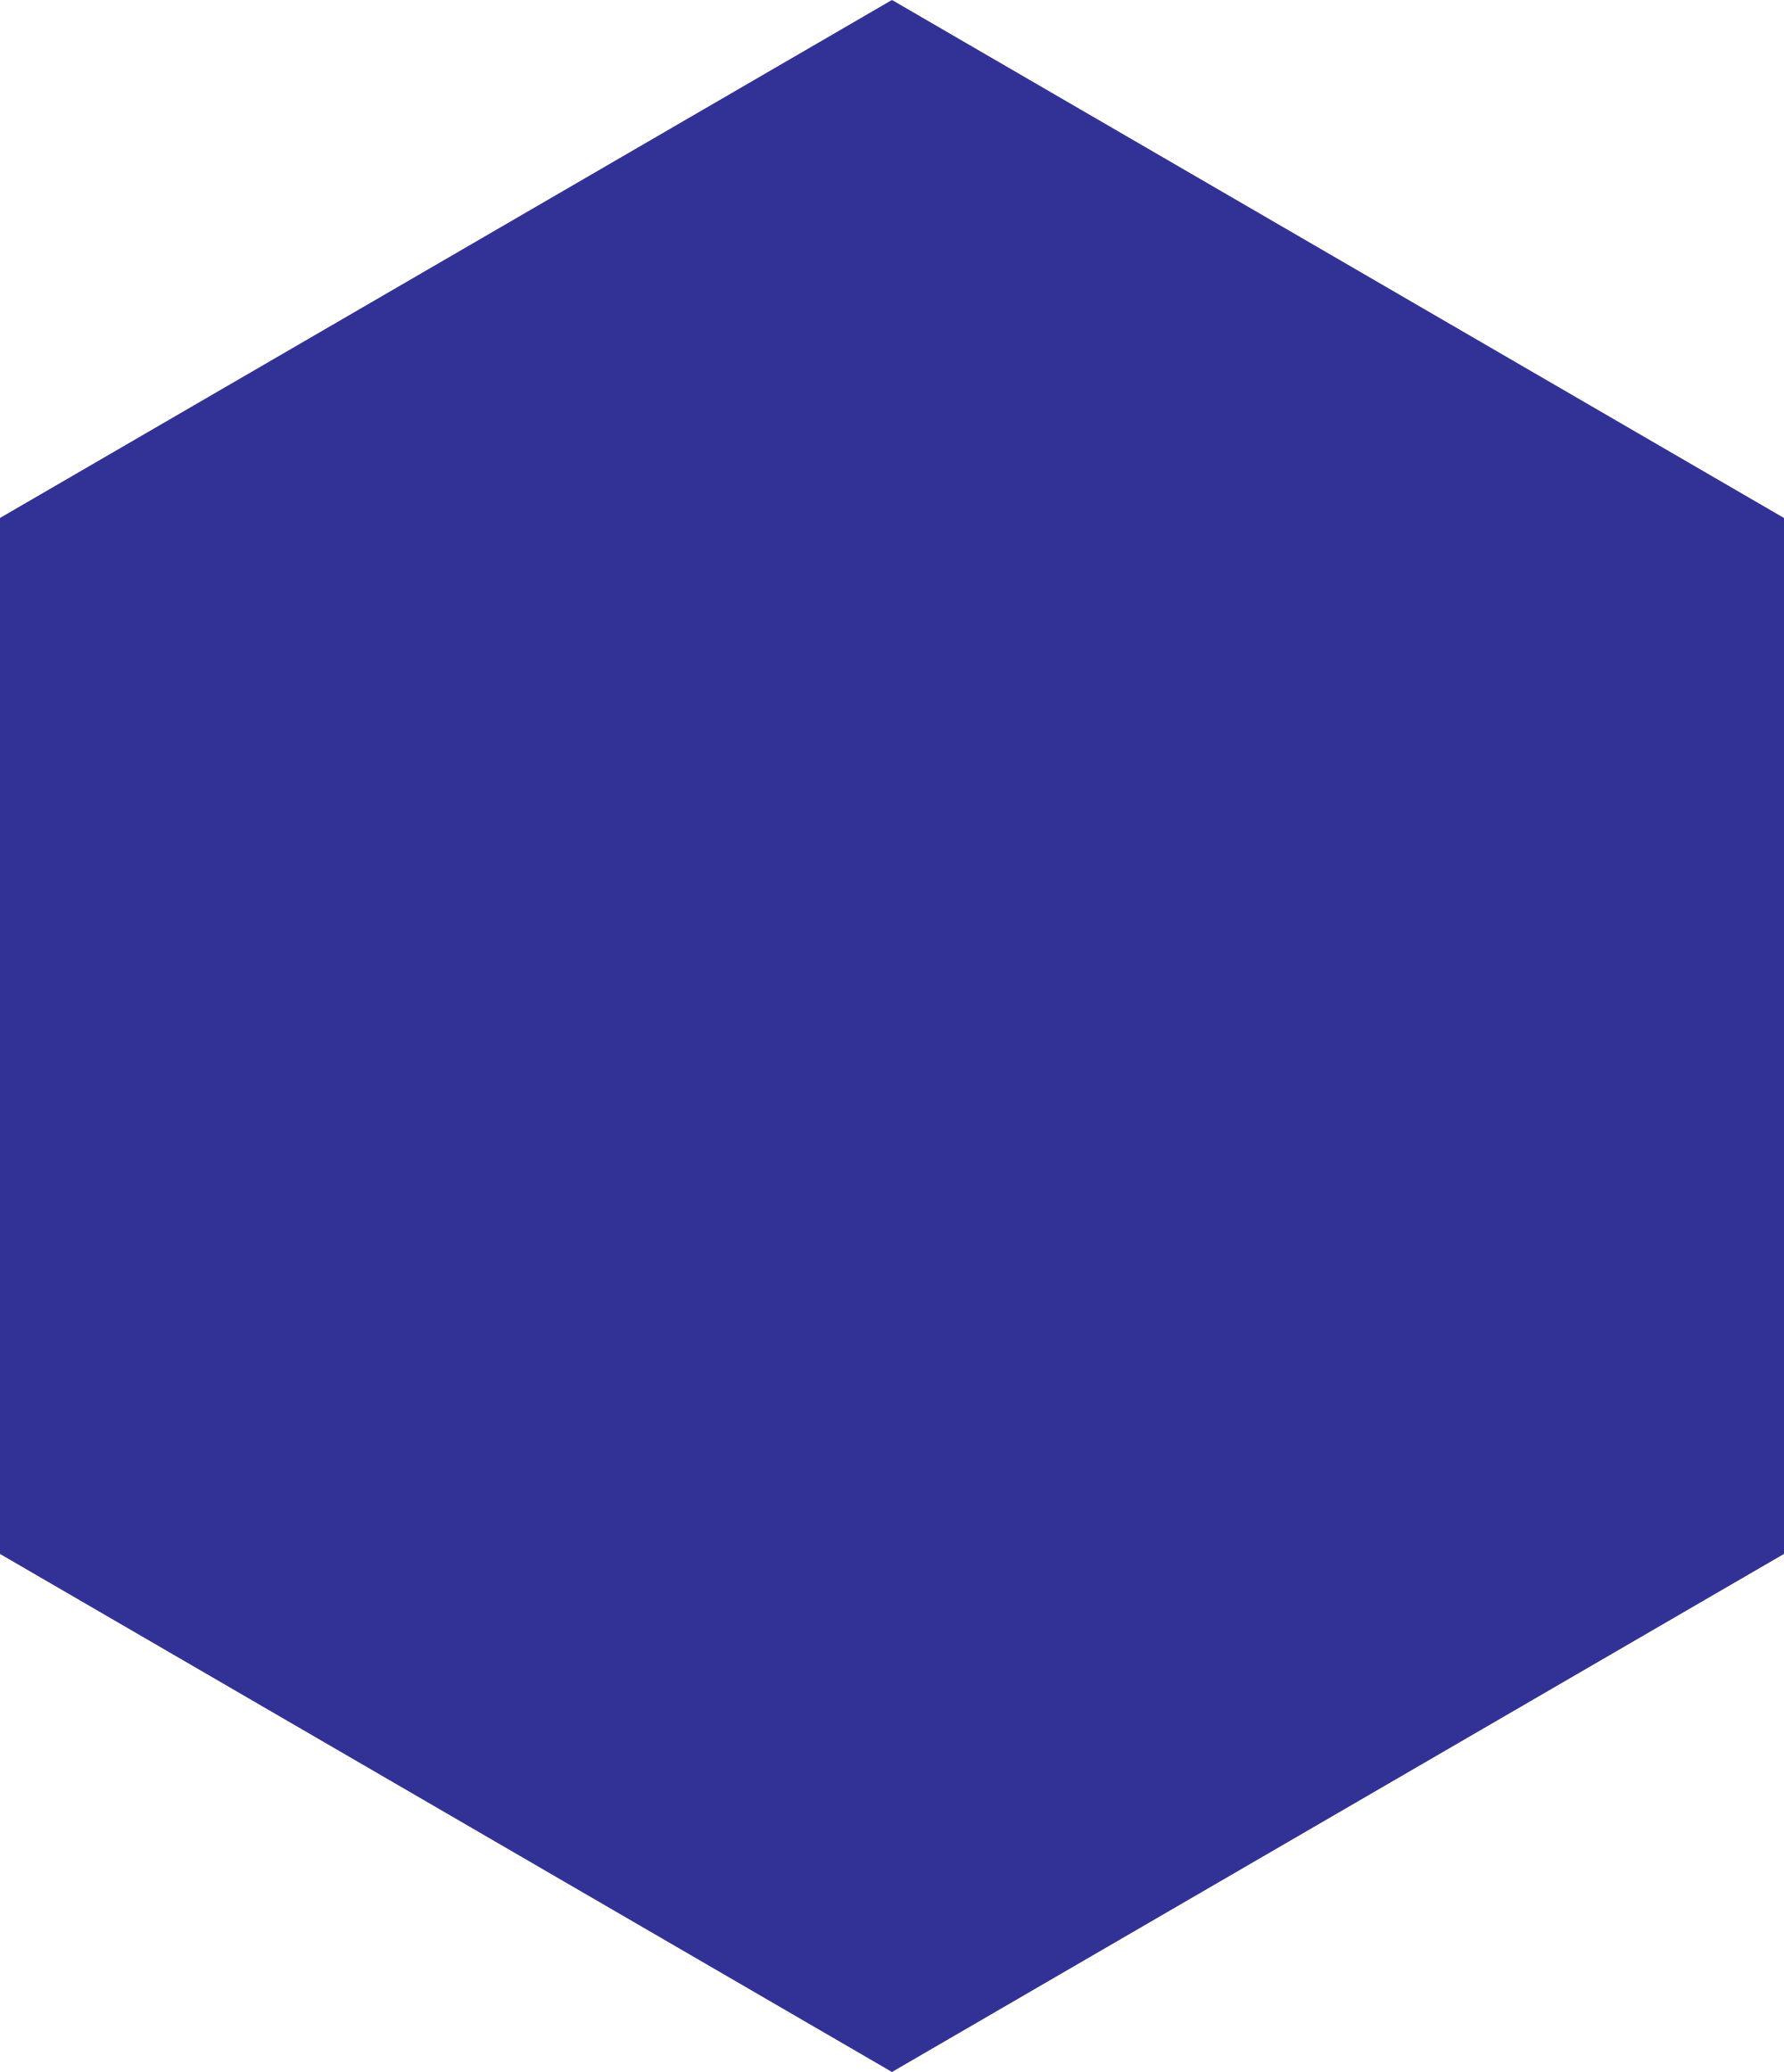 File:Blank vertex Hexagonal Icon.svg.